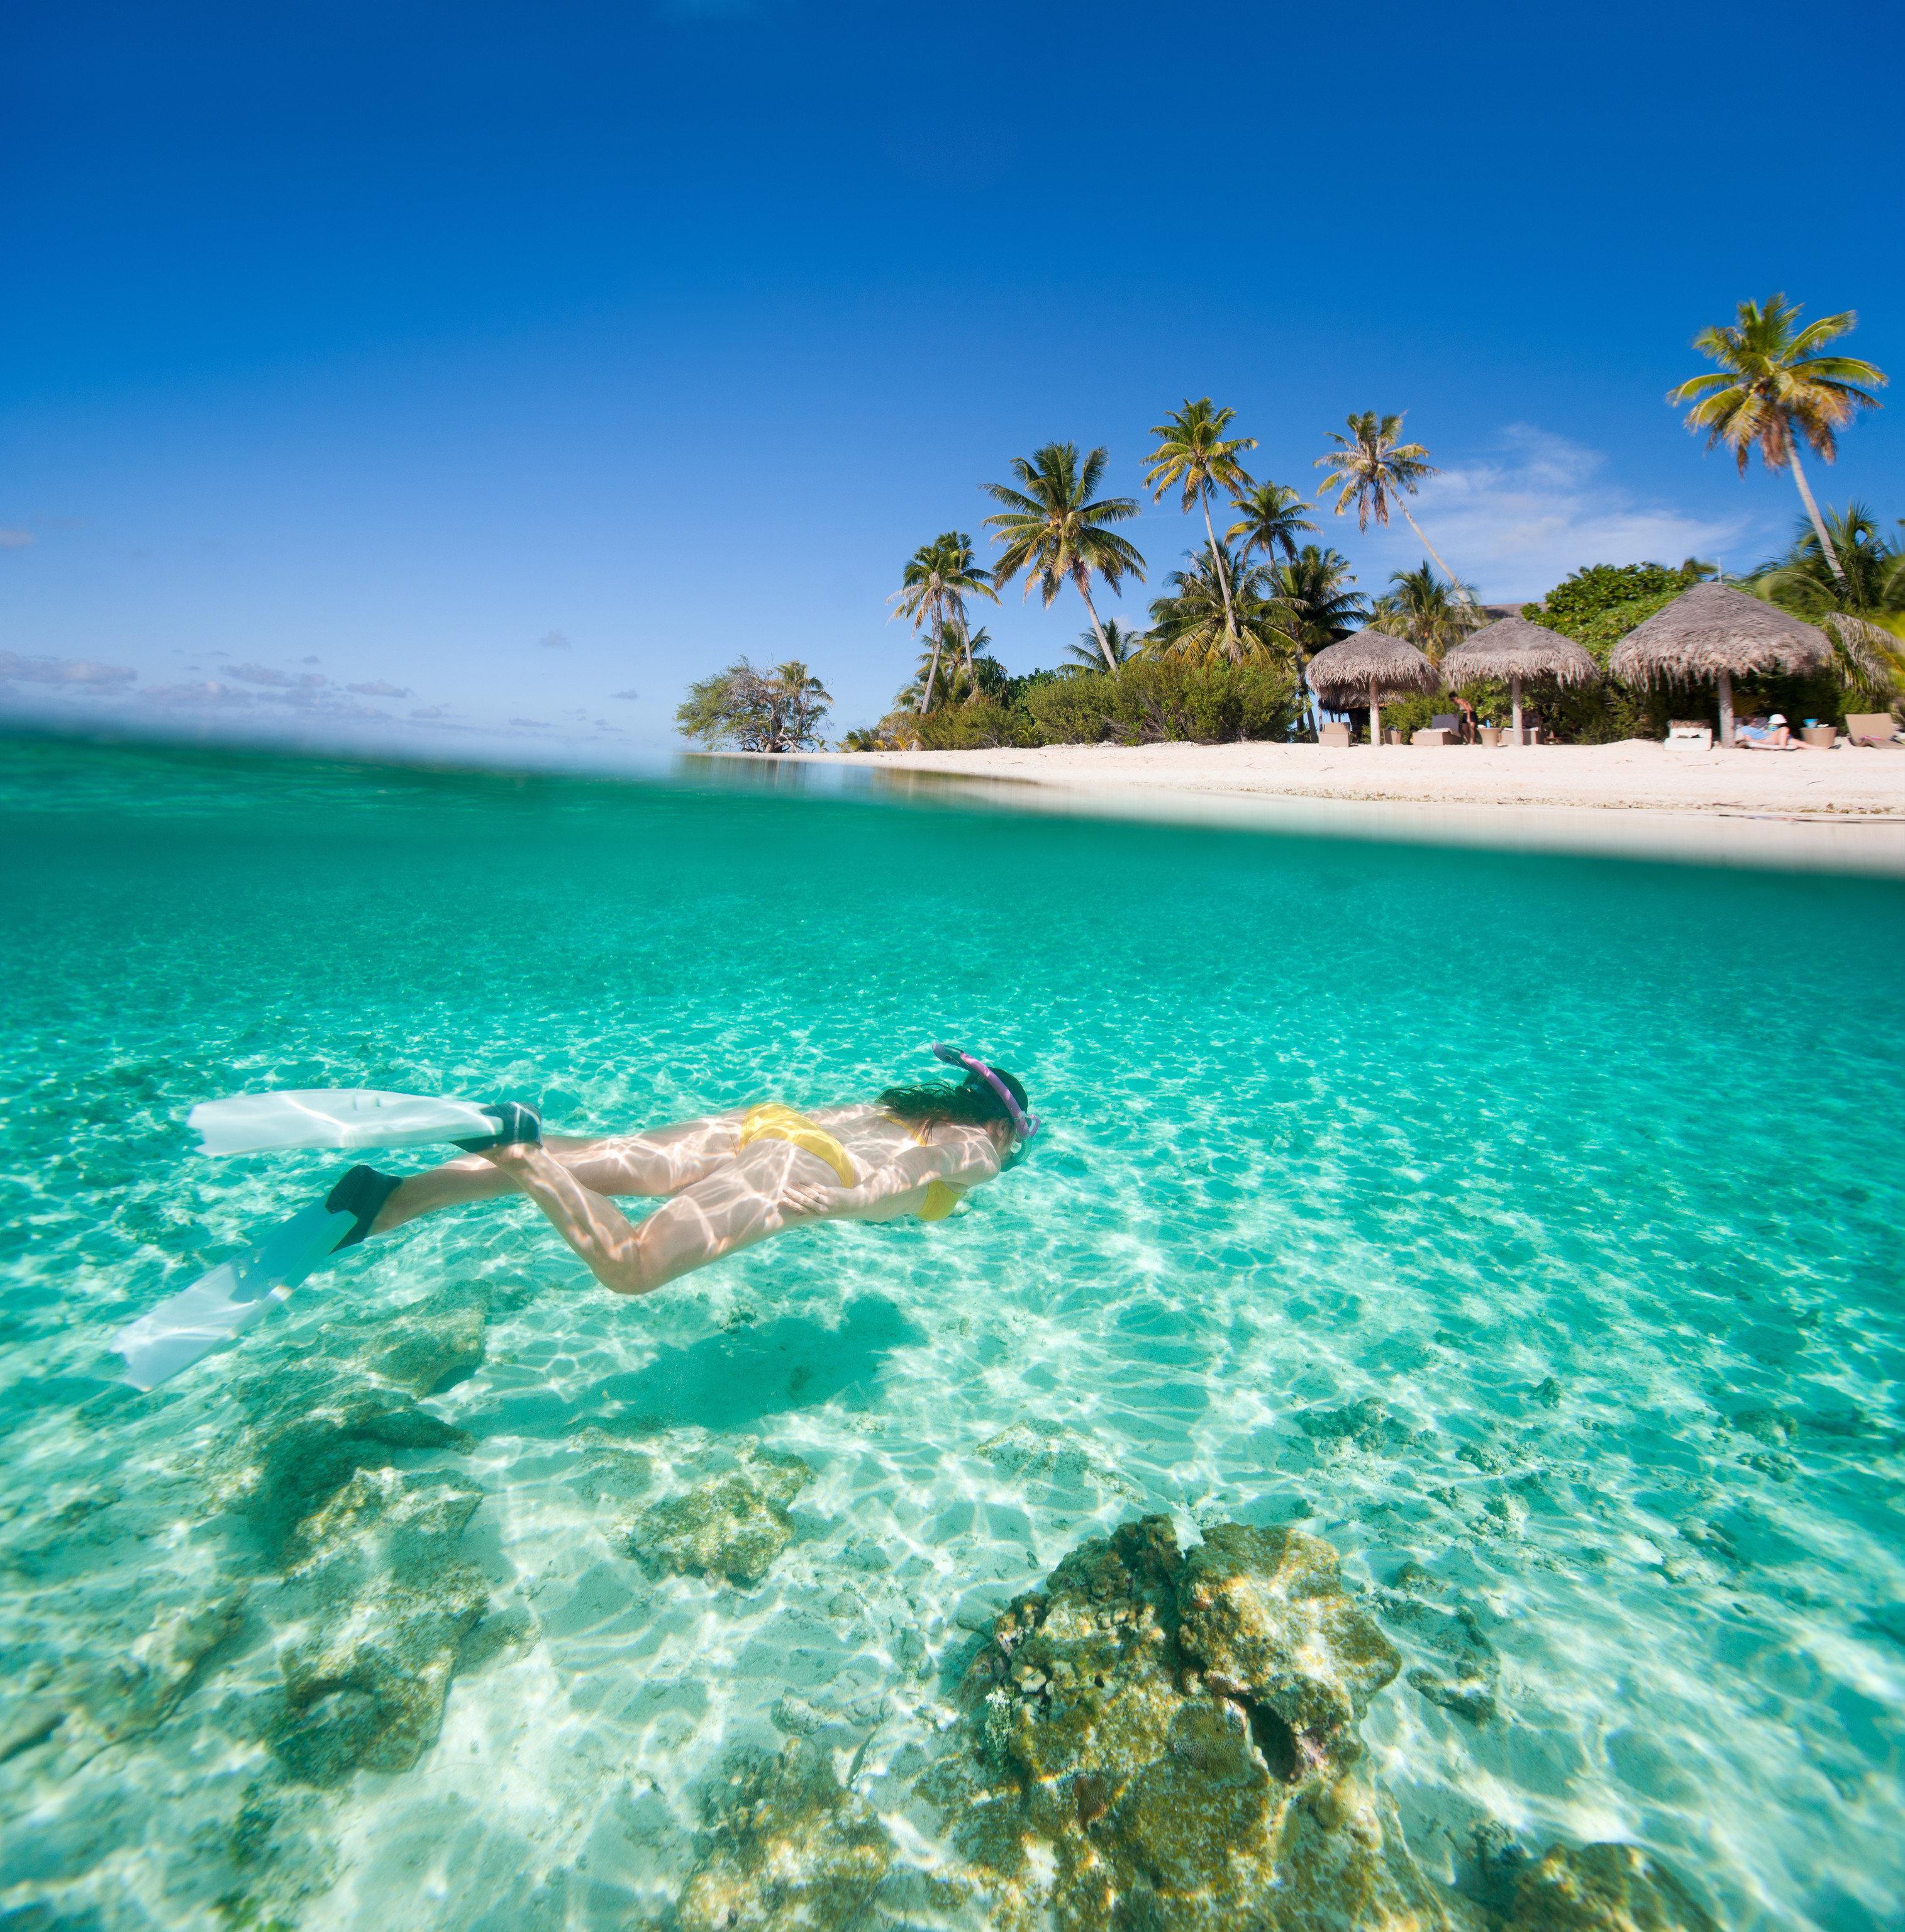 Trip Ideas water sky outdoor Sea caribbean Ocean vacation Beach water sport swimming pool tropics shore islet Island Lagoon Coast bay cape cay atoll wave swimming